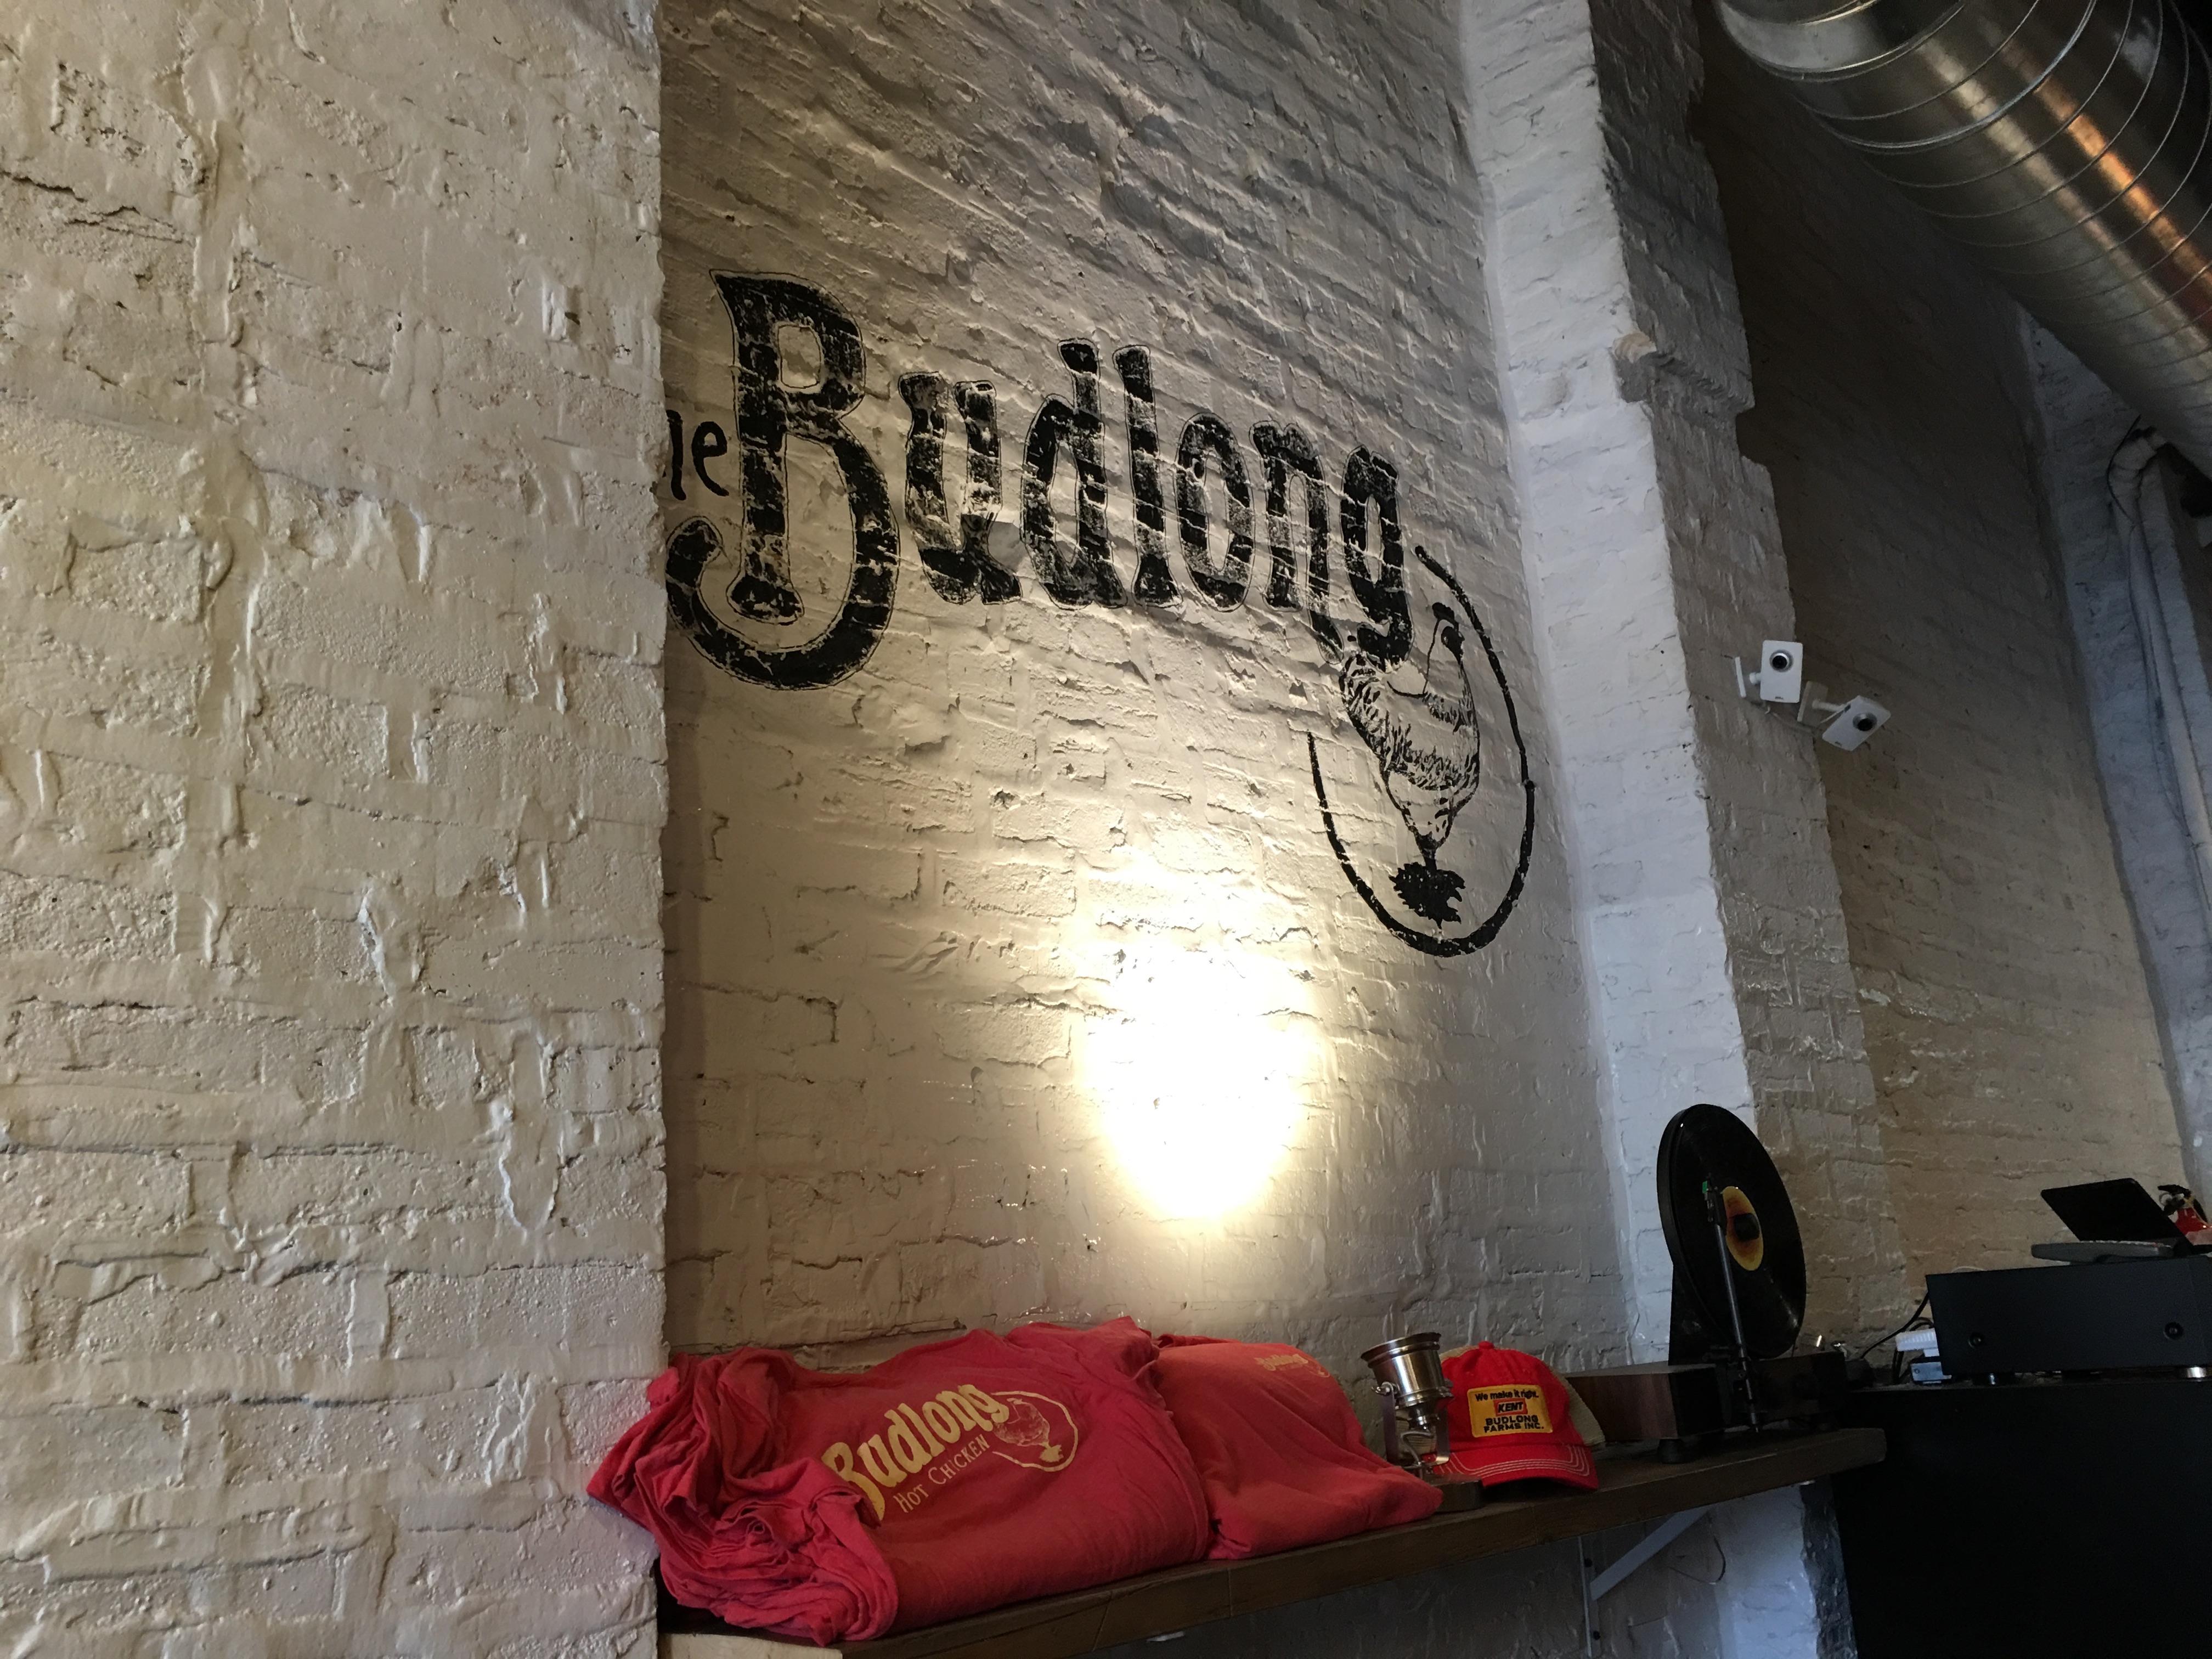 The Budlong interior